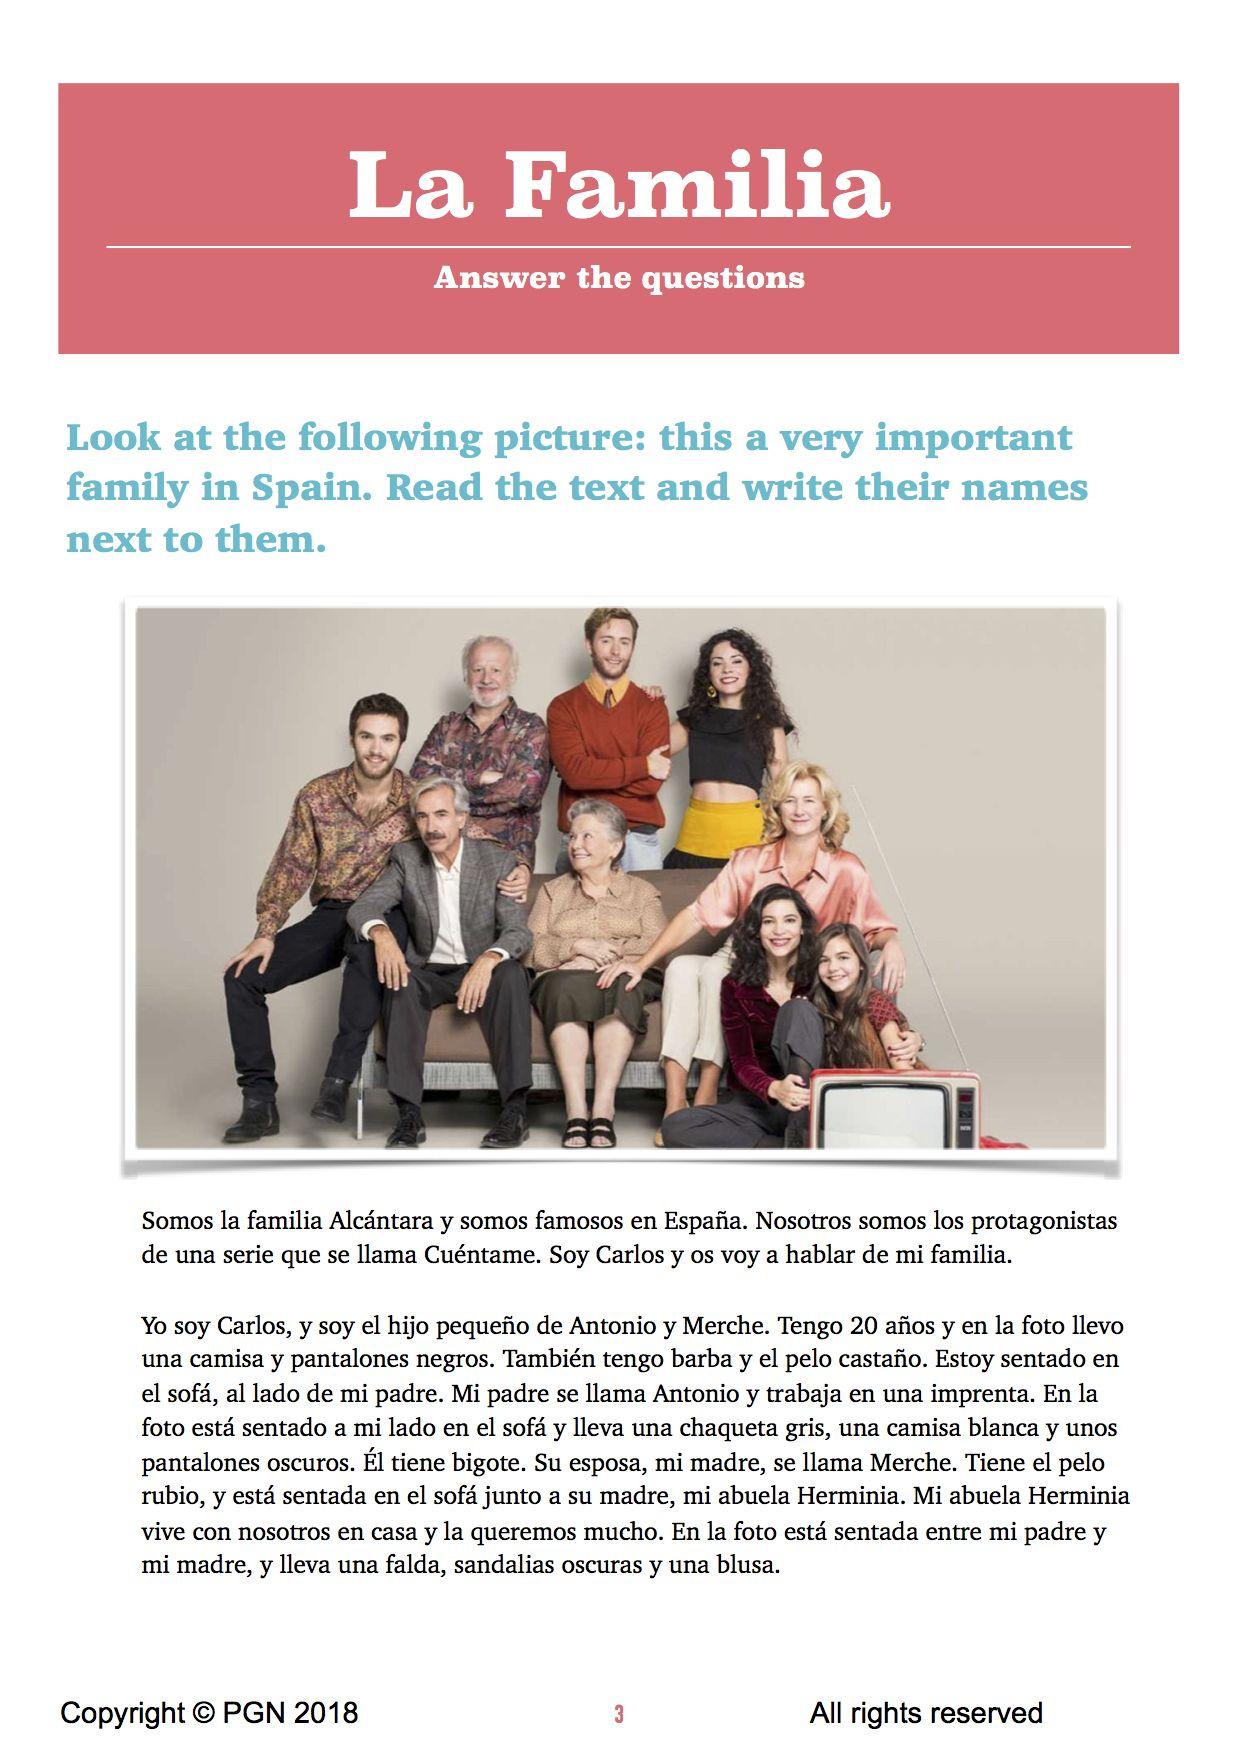 La Familia Family In Spanish Class Is A Resource Full